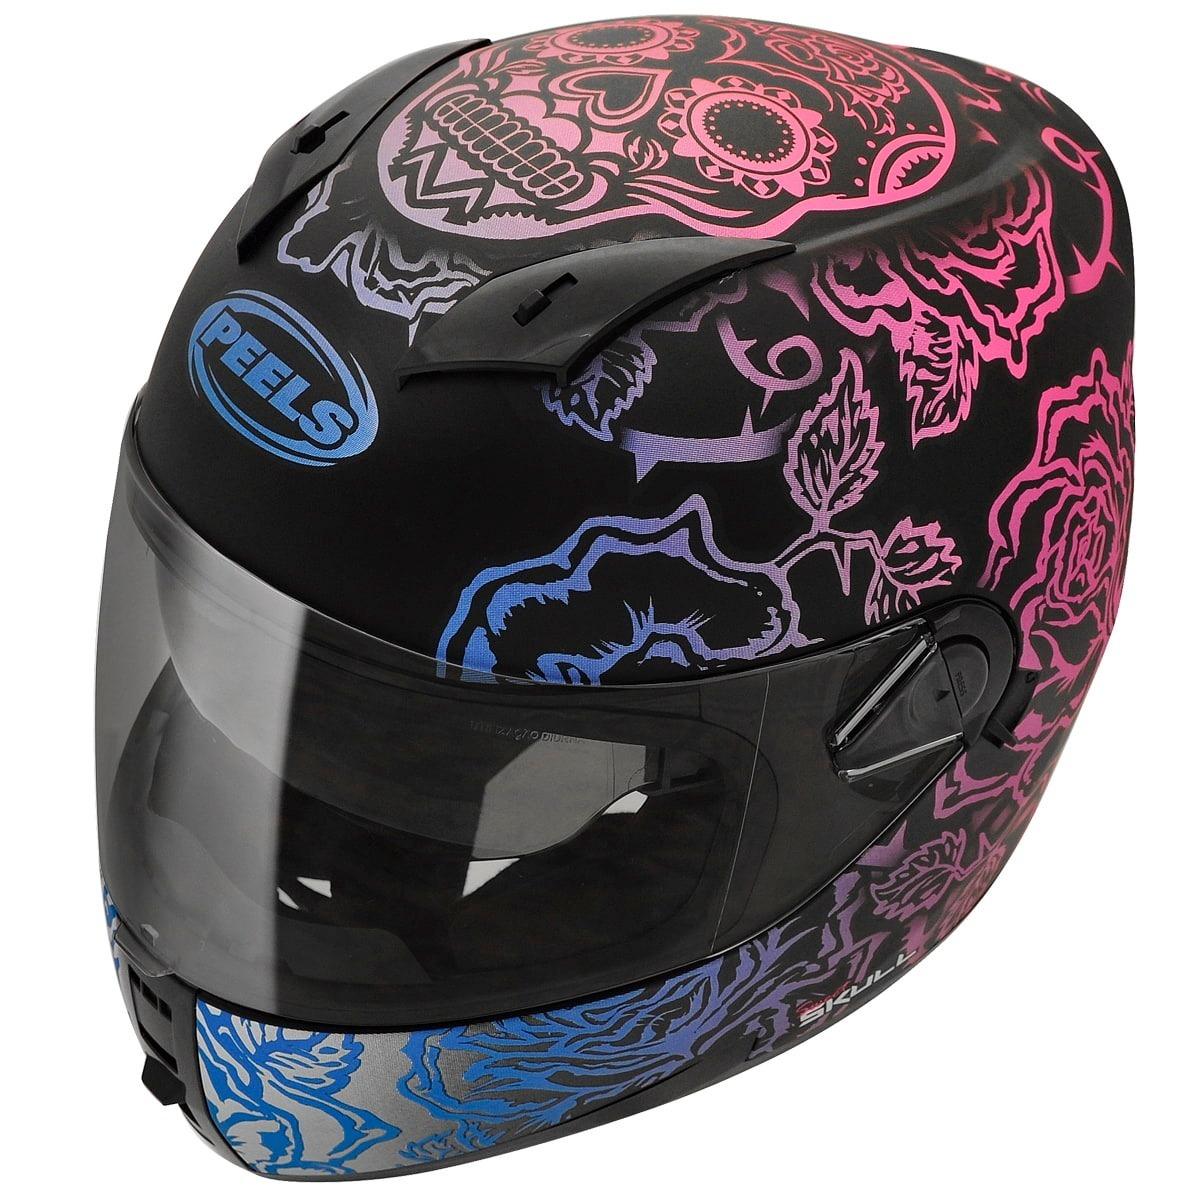 dca3fd8bb2a5c casco integral con gafas peels icon skull mujer qr motors. Cargando zoom.